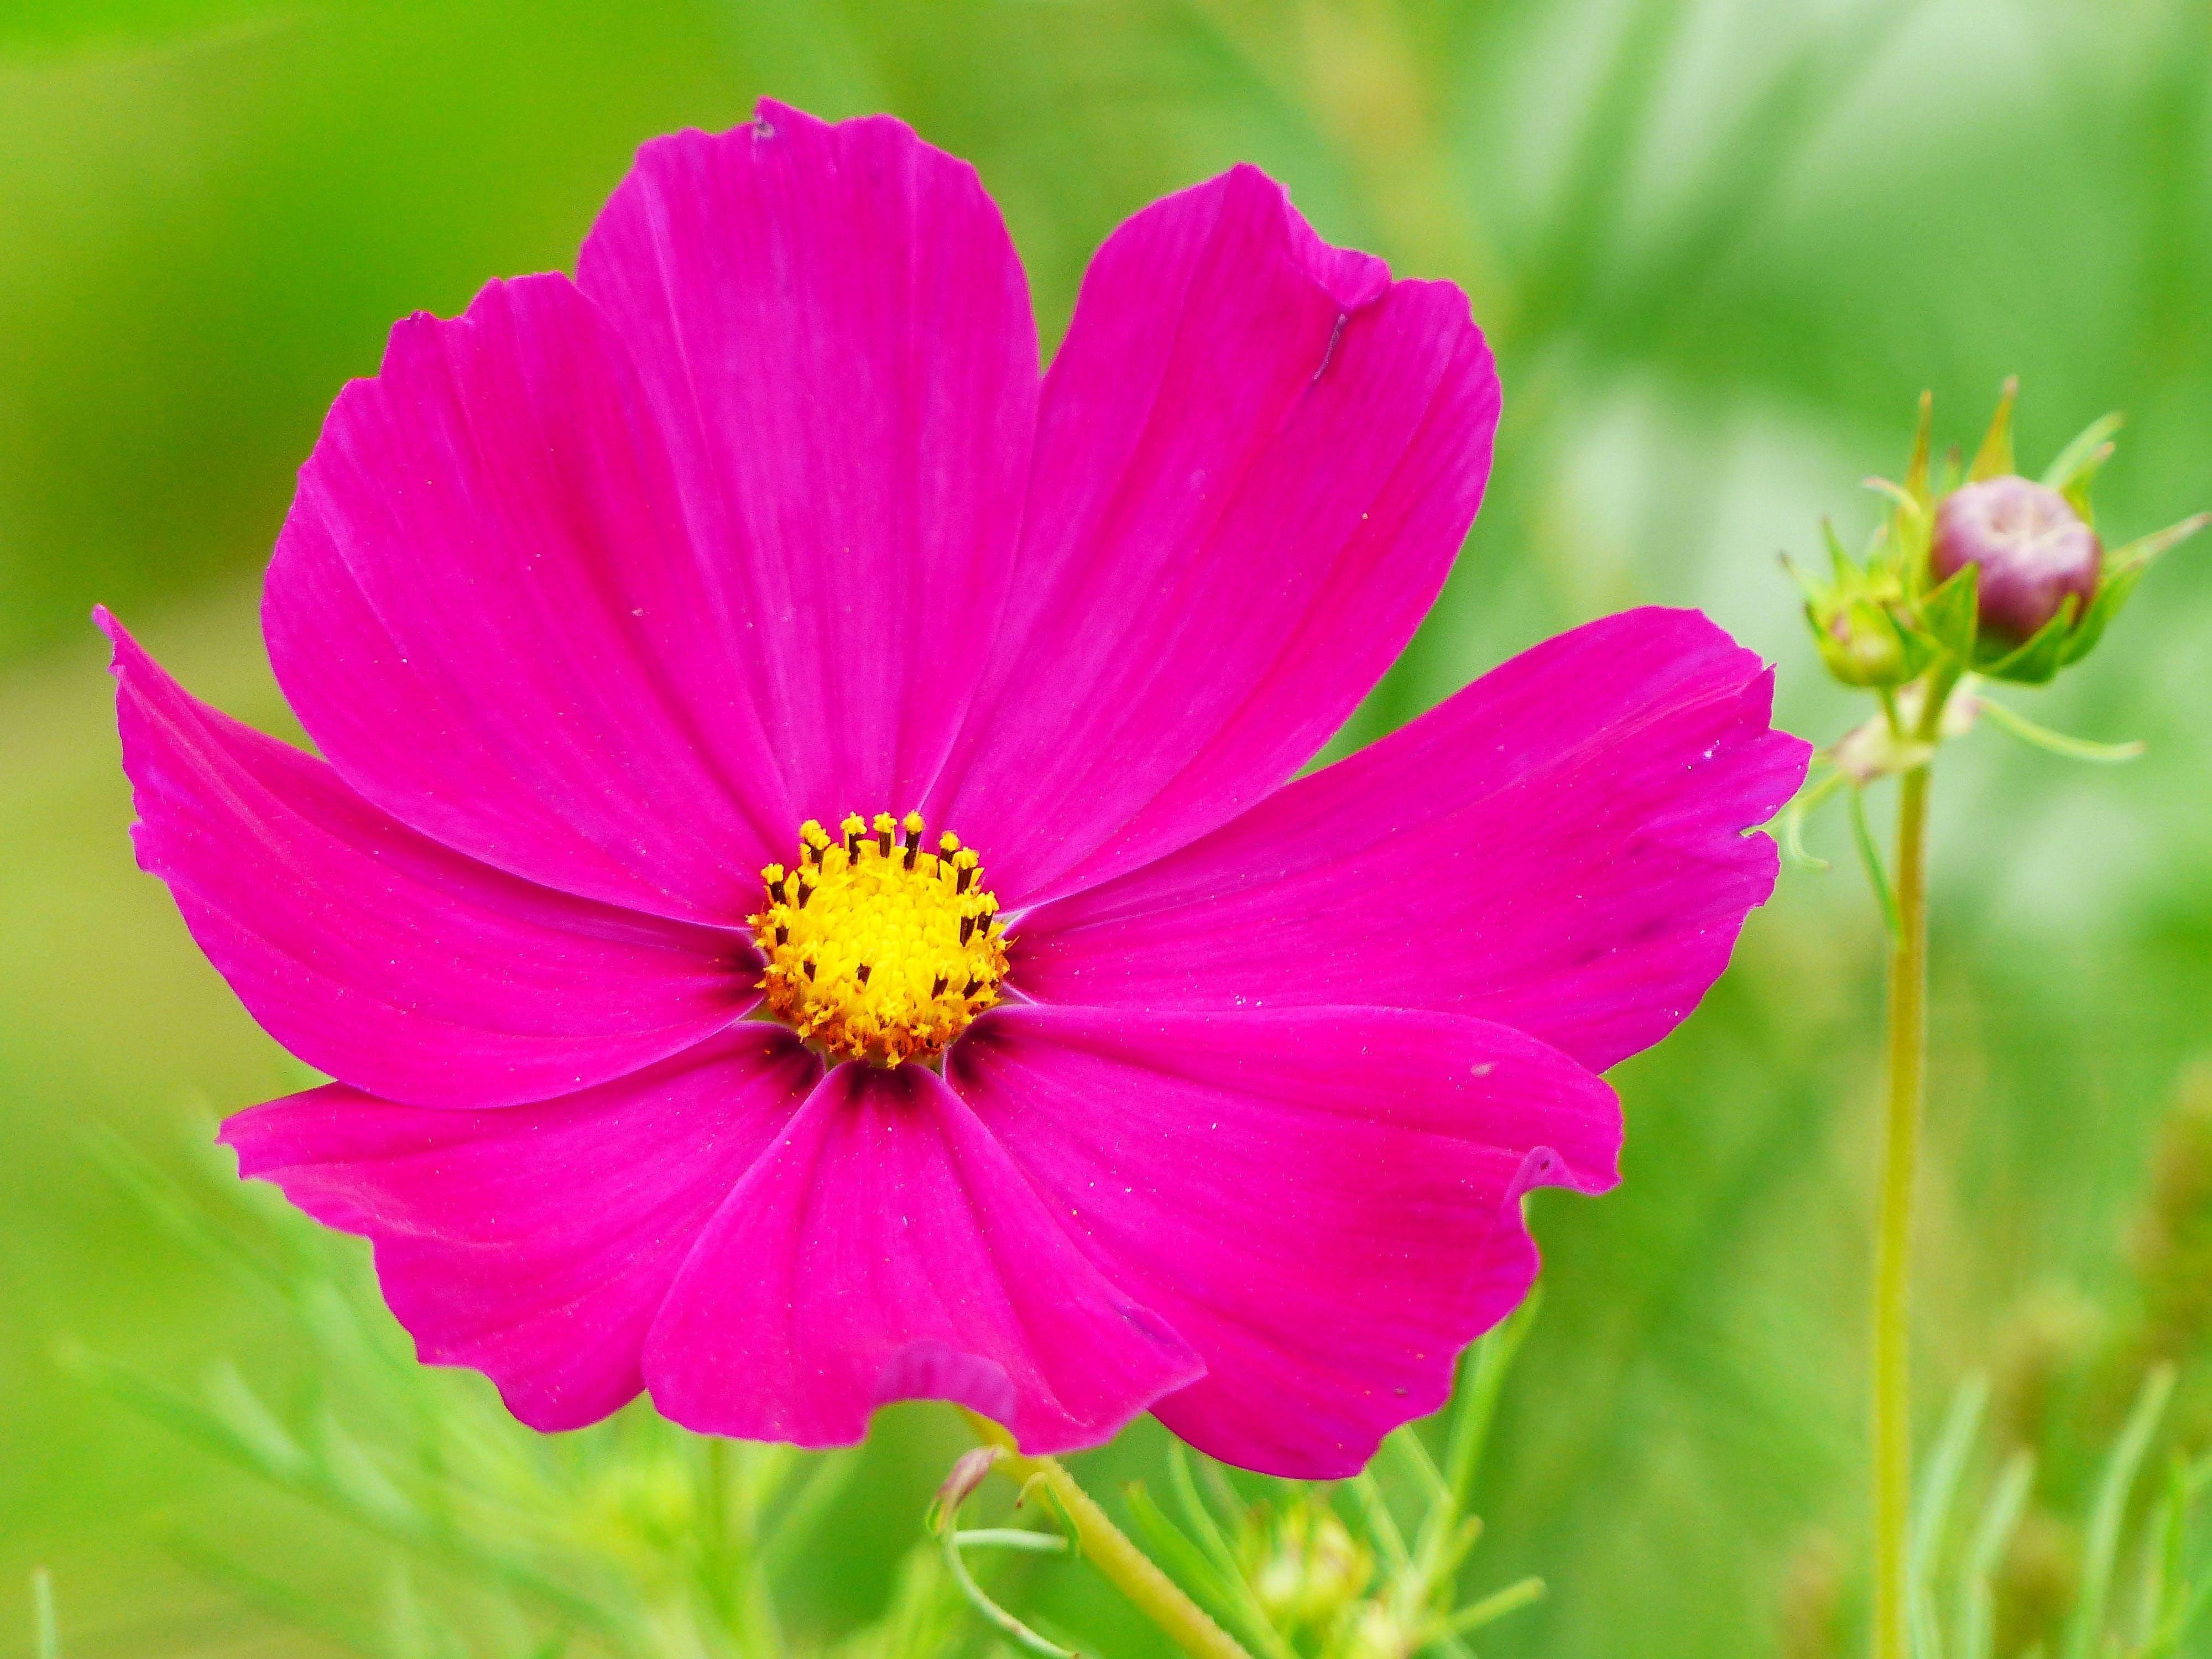 Free stock photo of bloom, blossom, bud, close